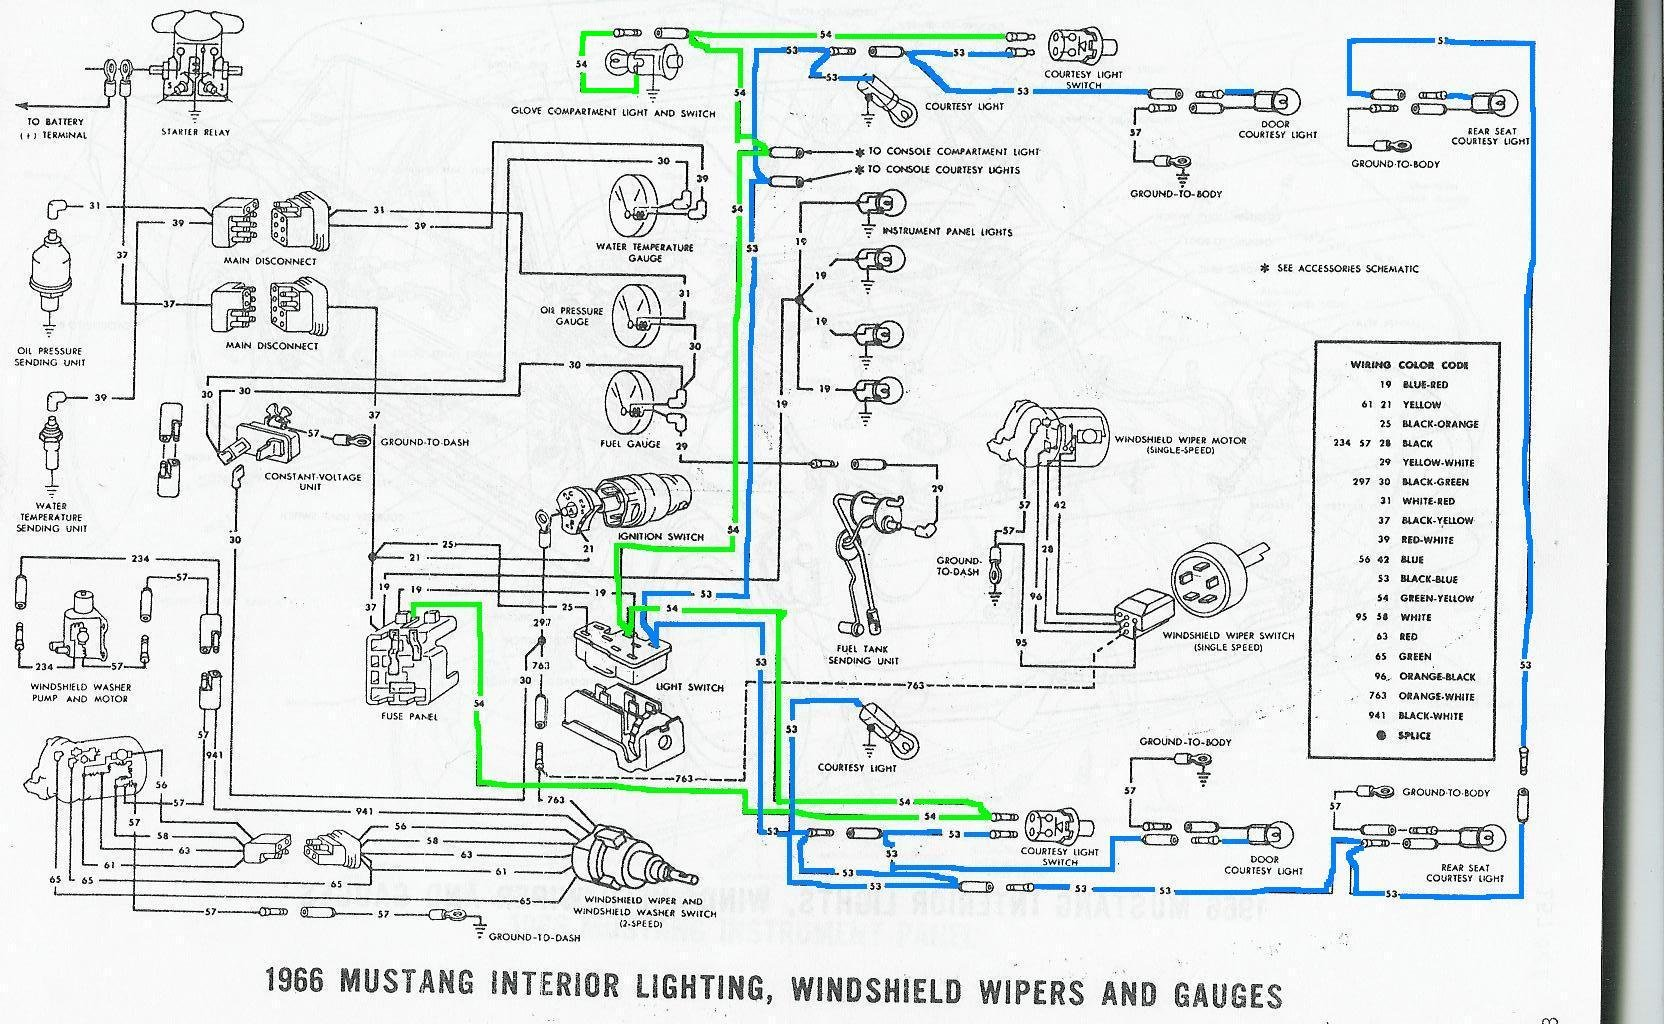 1966 Mustang Courtesy Light Wiring Diagram Wiring Diagram Sonata Sonata Graniantichiumbri It